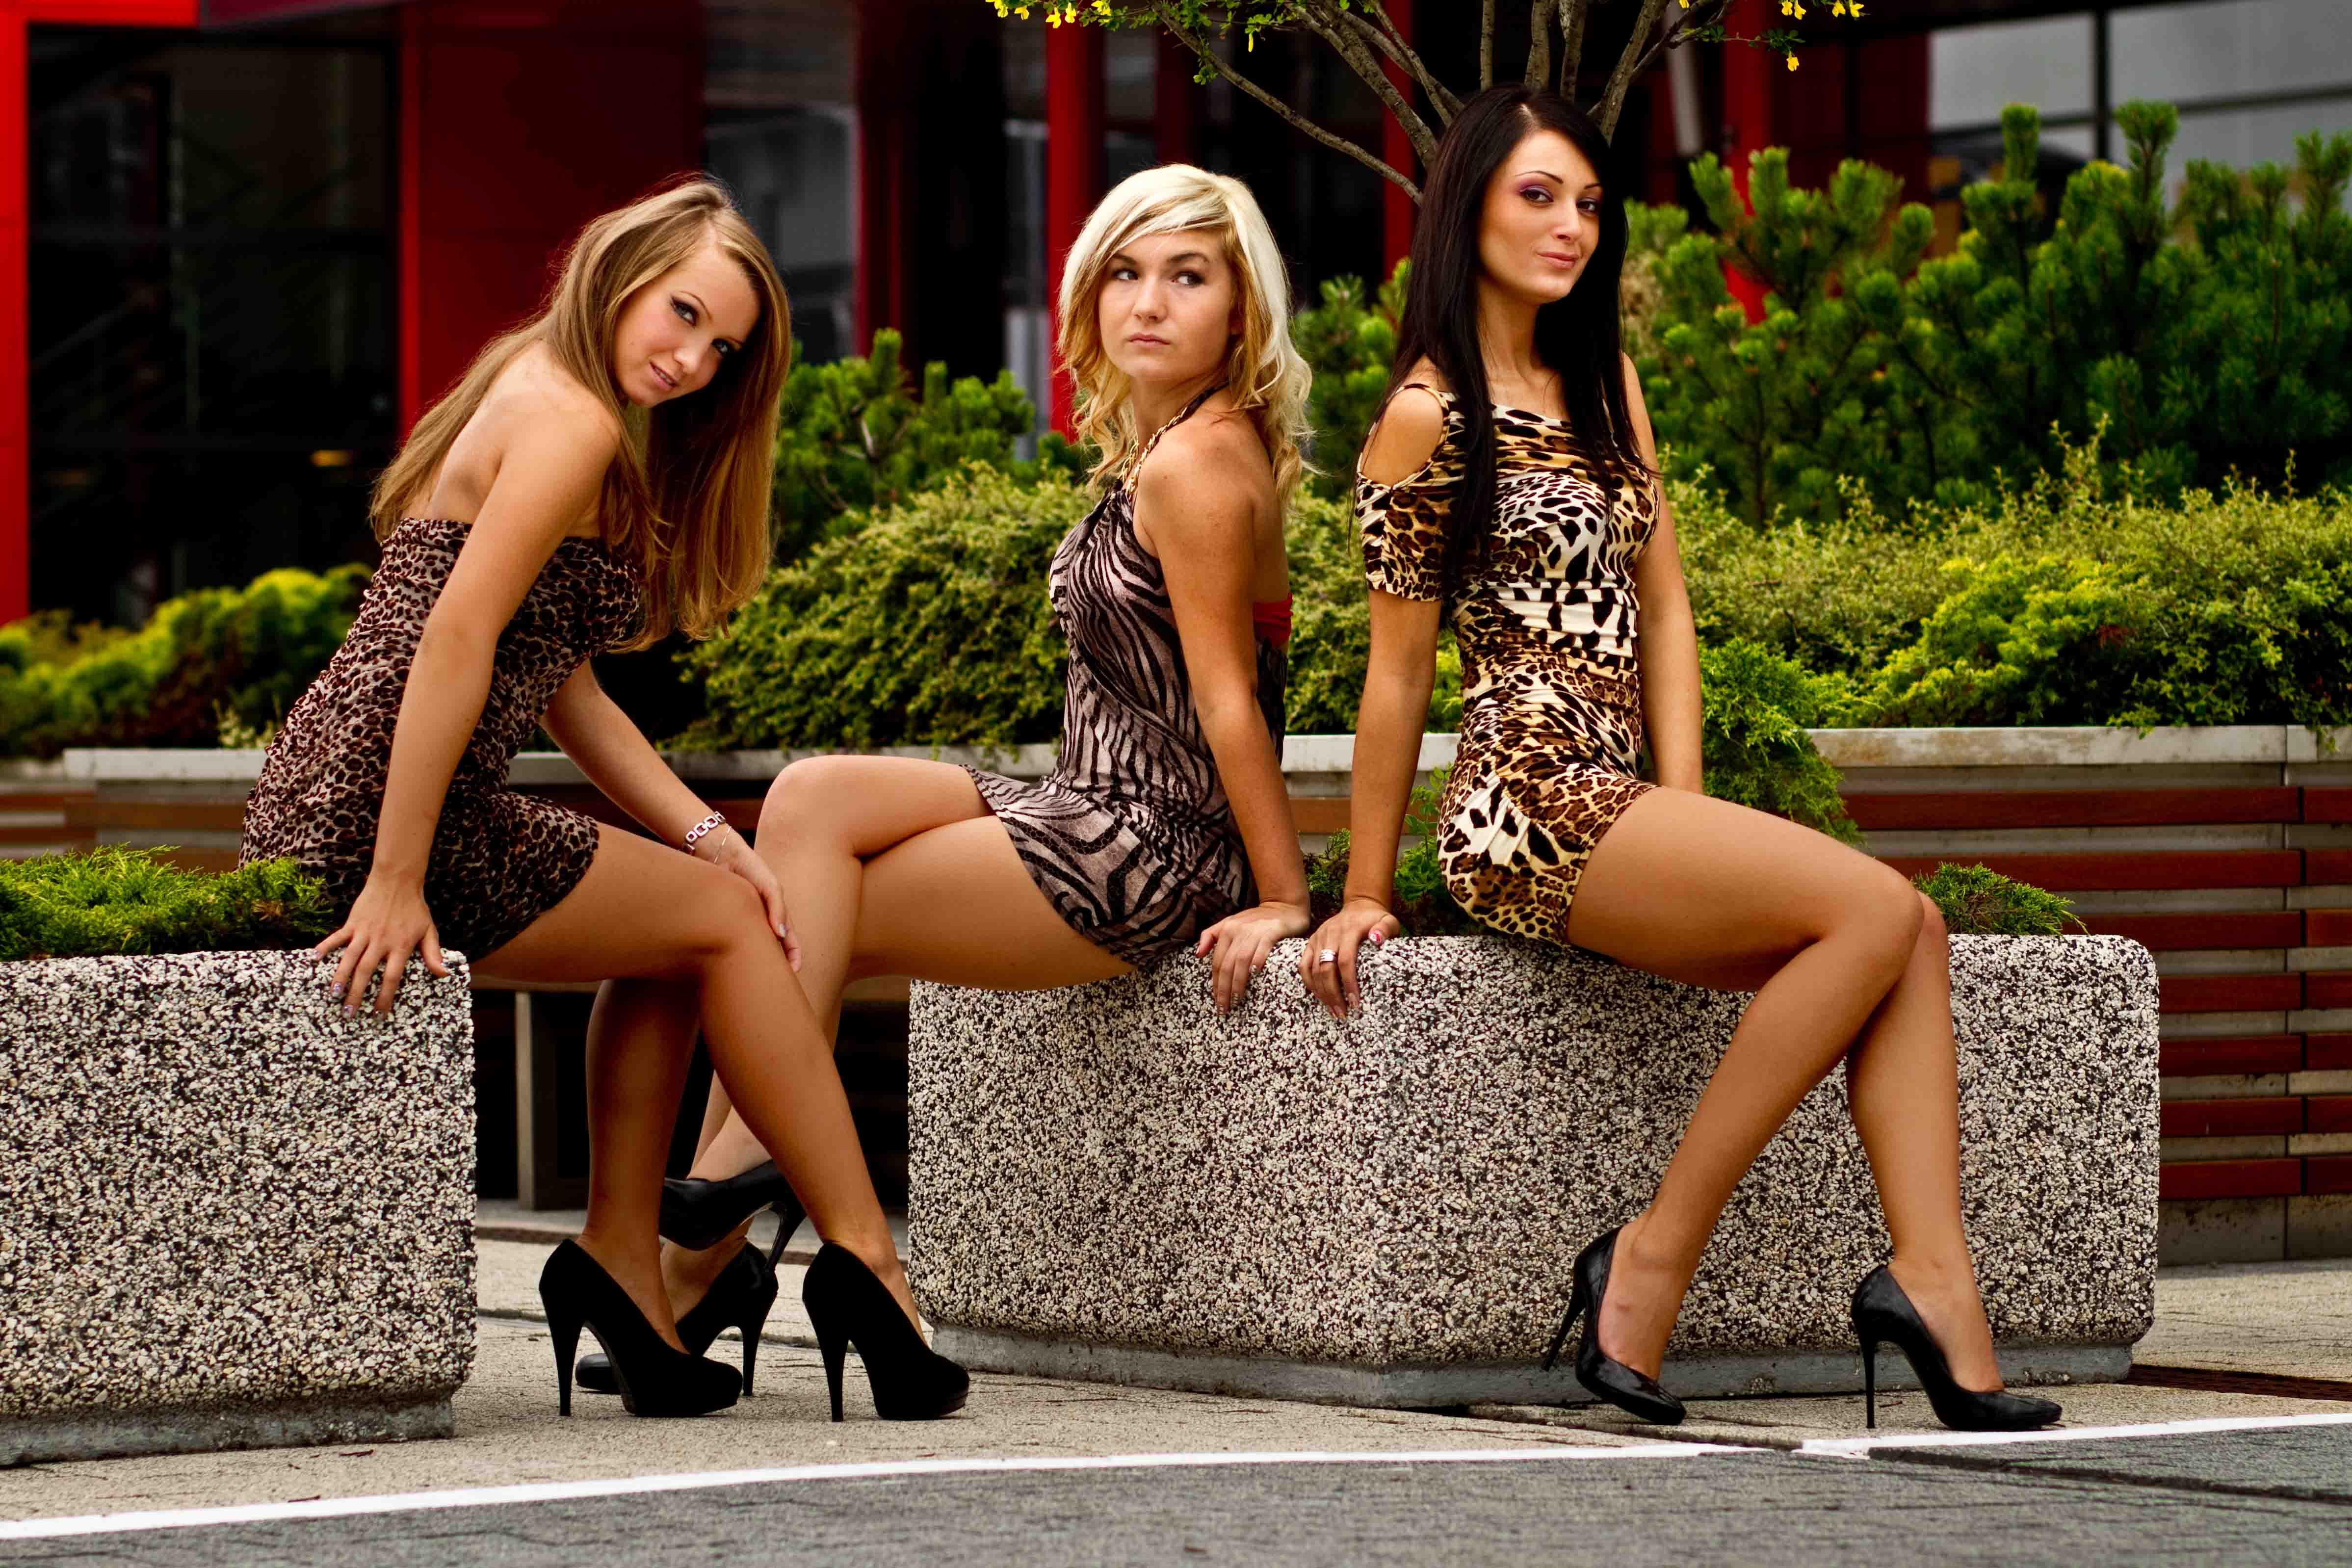 https://get.wallhere.com/photo/women-model-city-legs-sitting-dress-fashion-heels-shopping-clothing-supermodel-2010-perfection-Bella-long-girl-beauty-woman-lady-chica-guapa-leg-wonderful-short-wonder-linda-hermosa-perfect-lindo-stunning-beautifull-natasza-marvelosa-blond-iza-sexinthecity-go-ka-sylka-human-positions-photo-shoot-thigh-506890.jpg